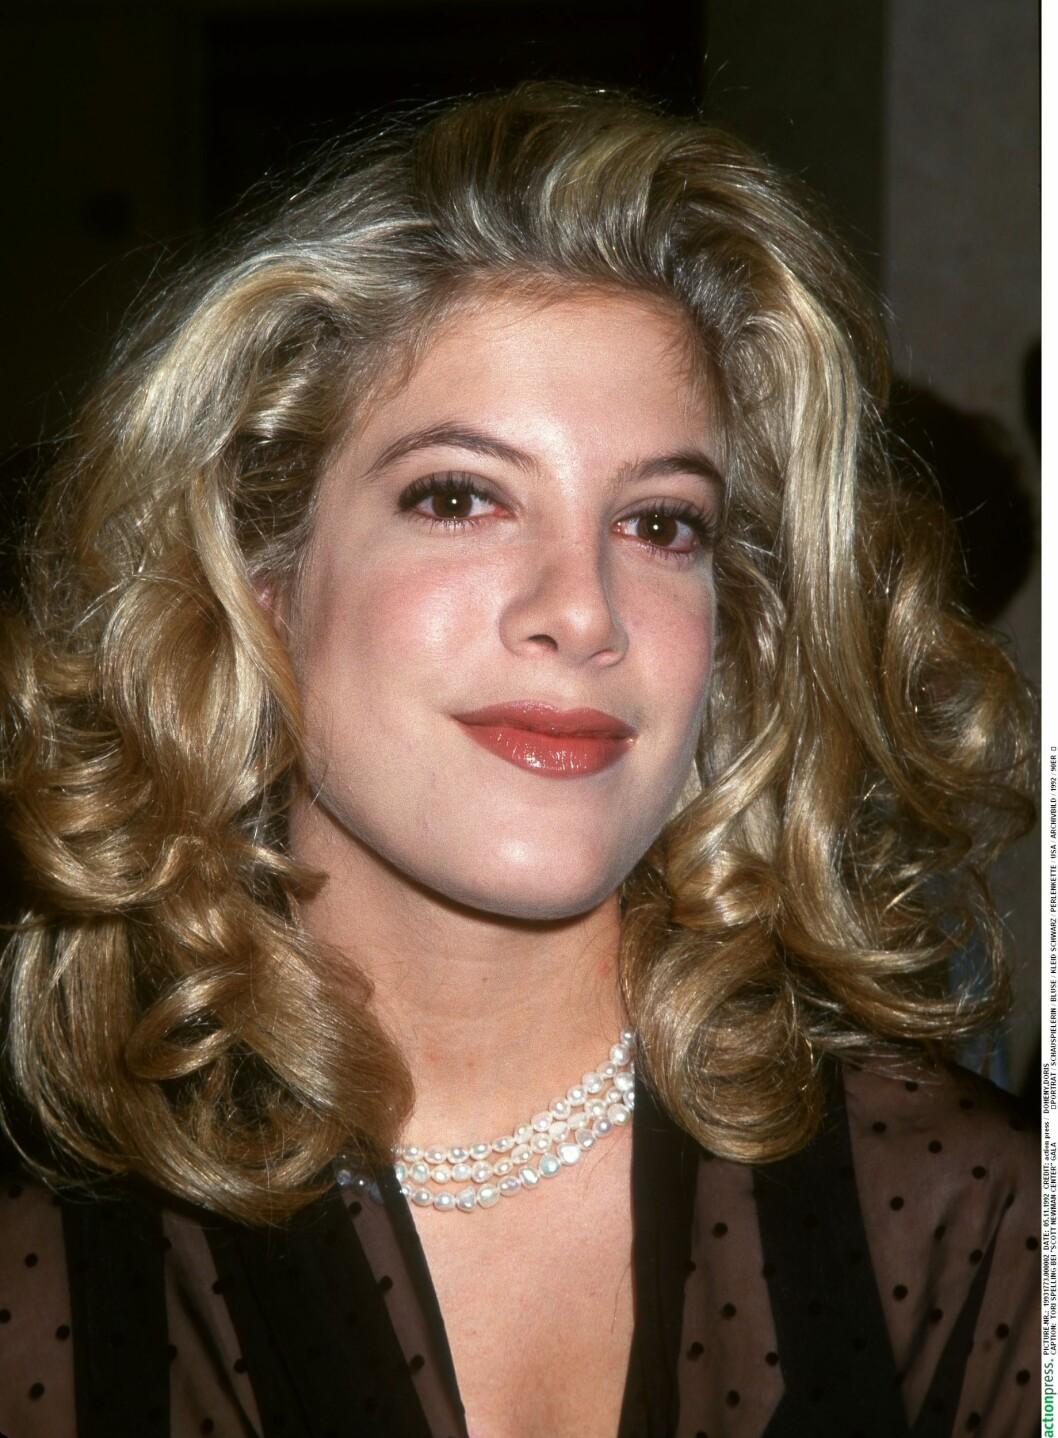 Tori Spelling i 1992.  Foto: action press/All Over Press